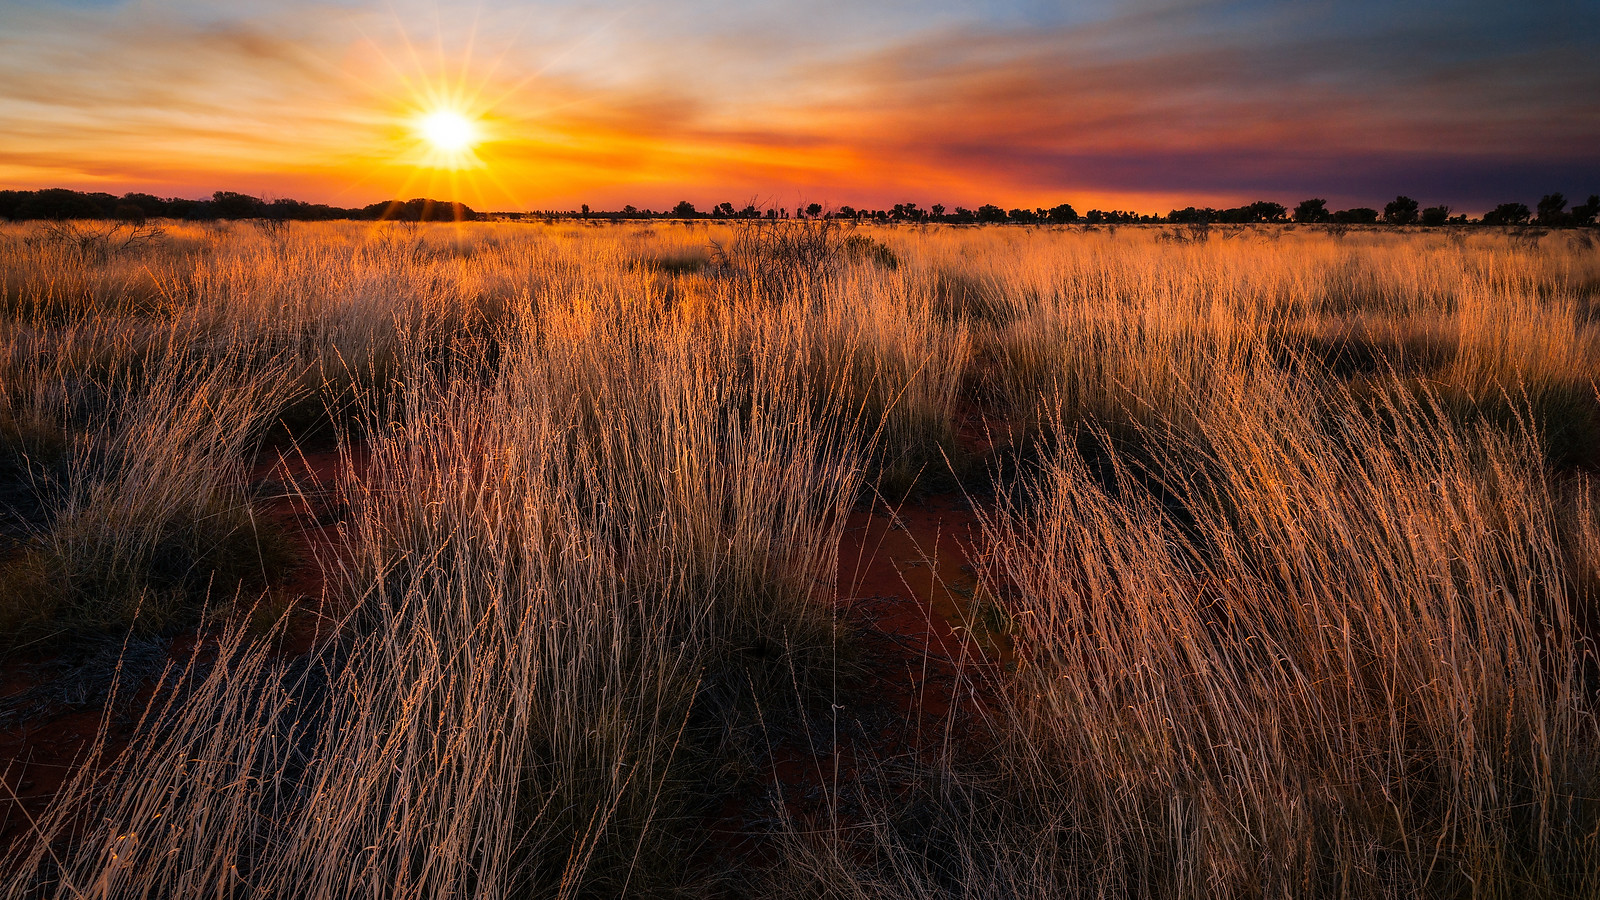 Bush-fire, Spinifex sunset and sunstar. Uluru-Kata Tjuta national park, Australia